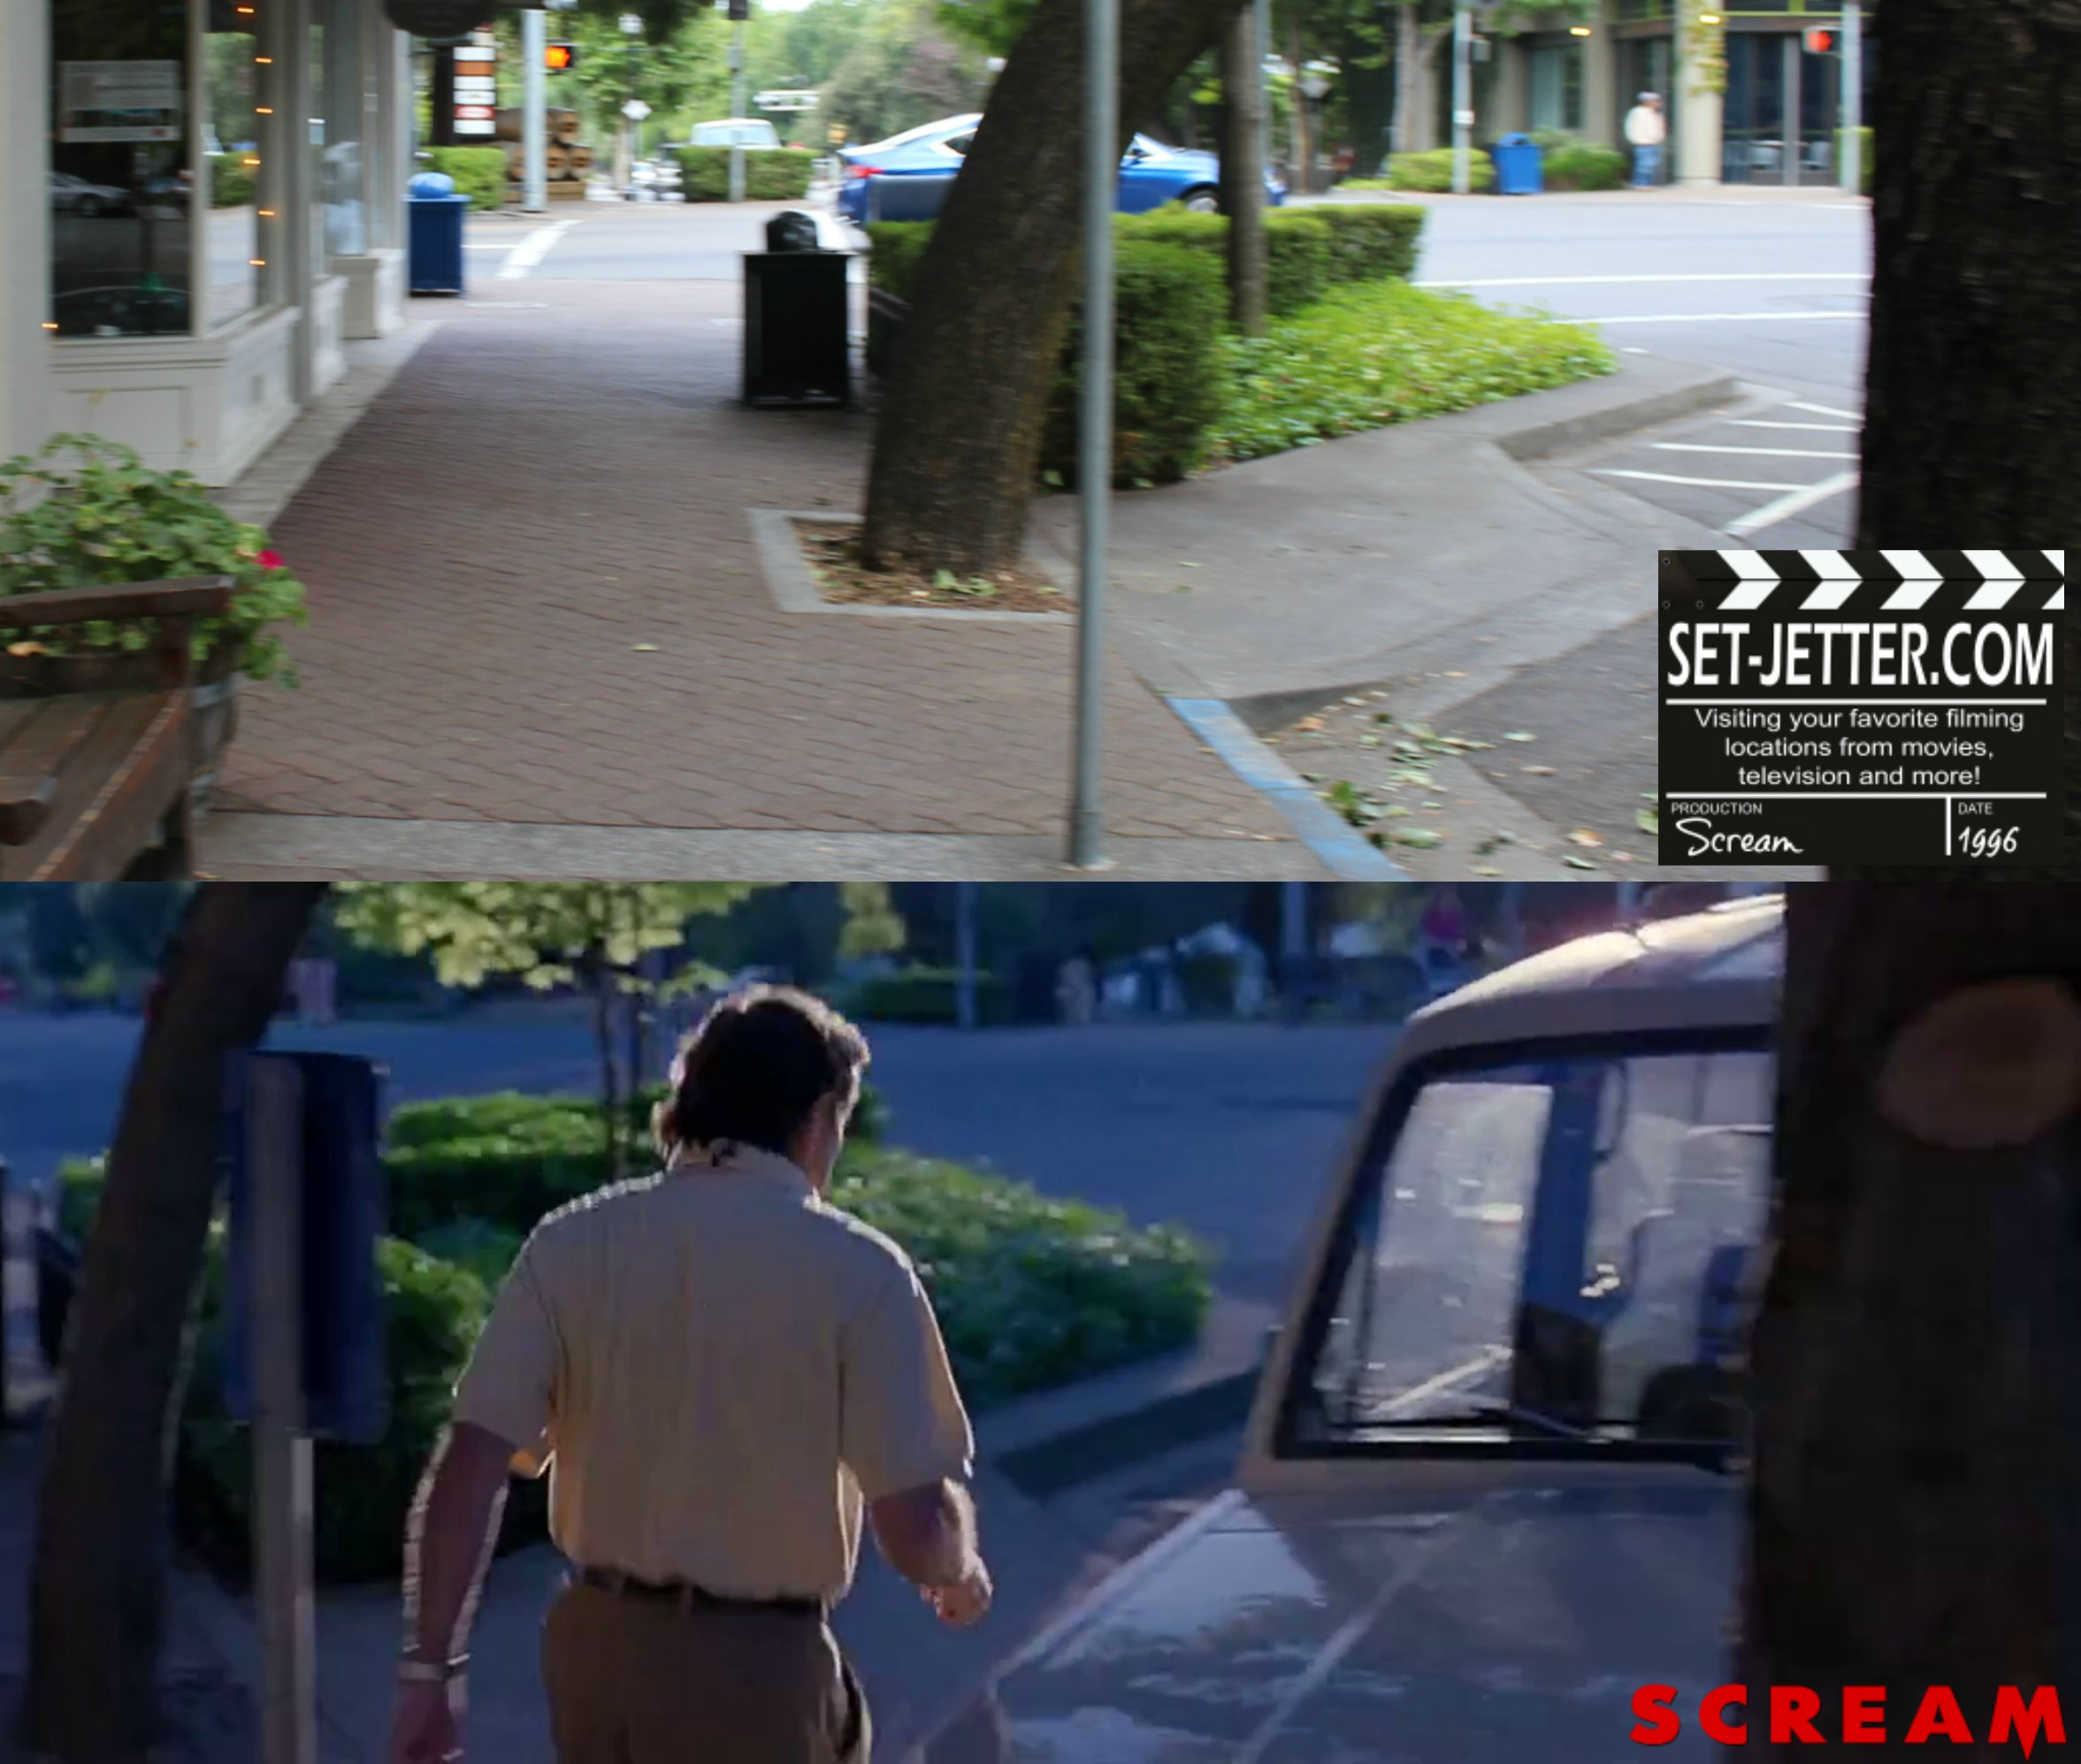 Scream comparison 174.jpg